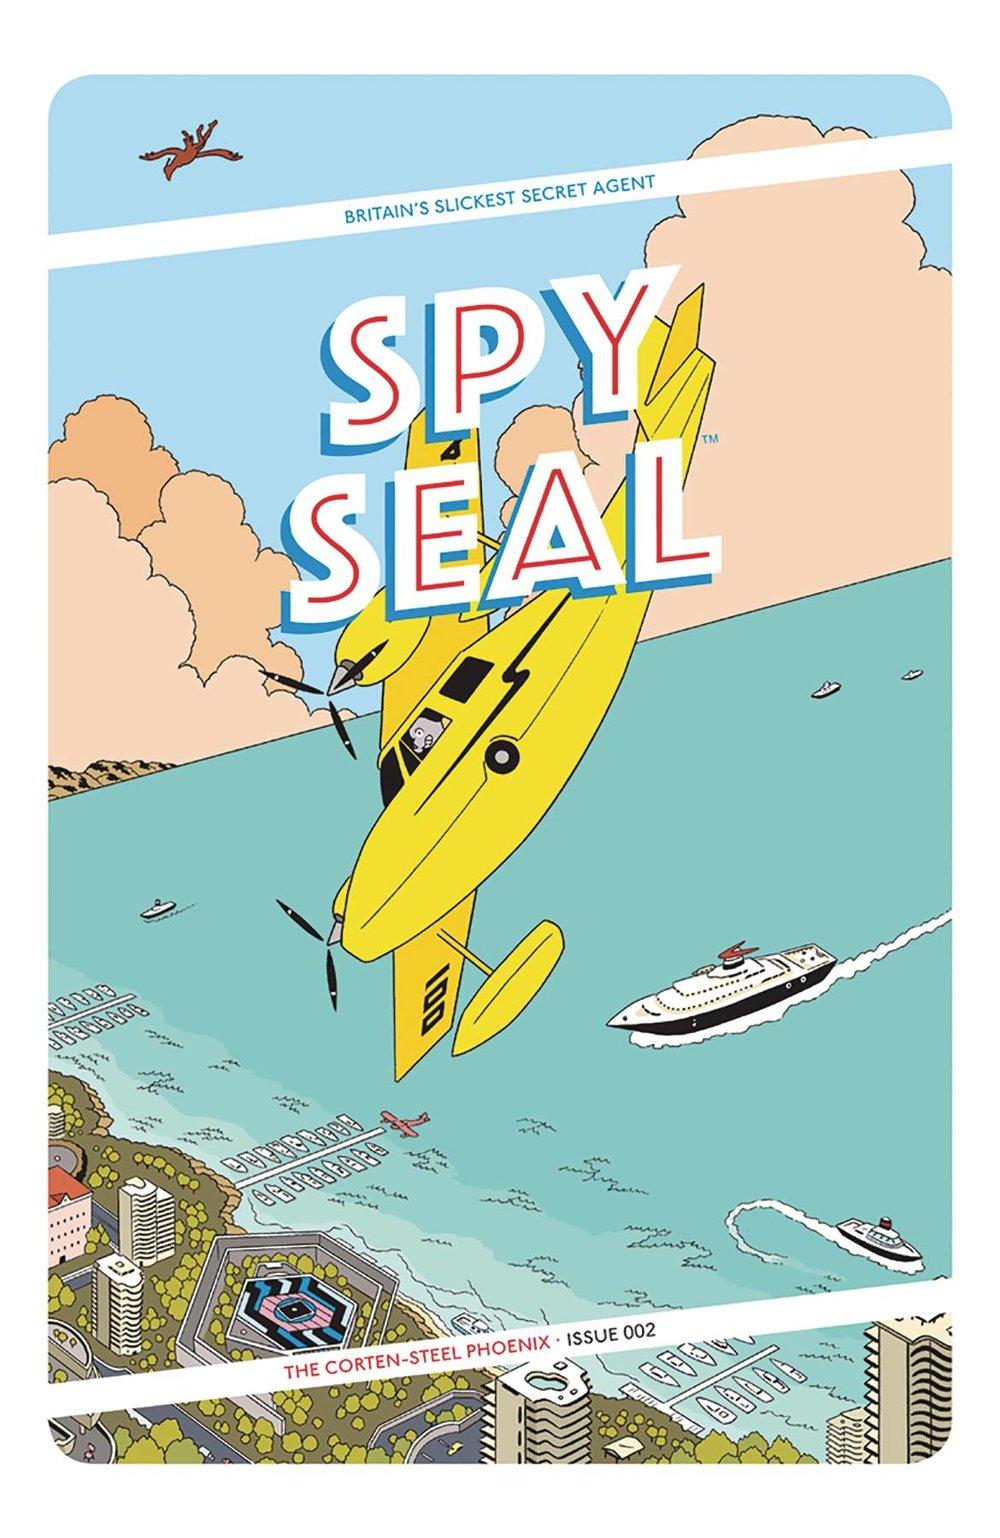 Spy seal1.jpg